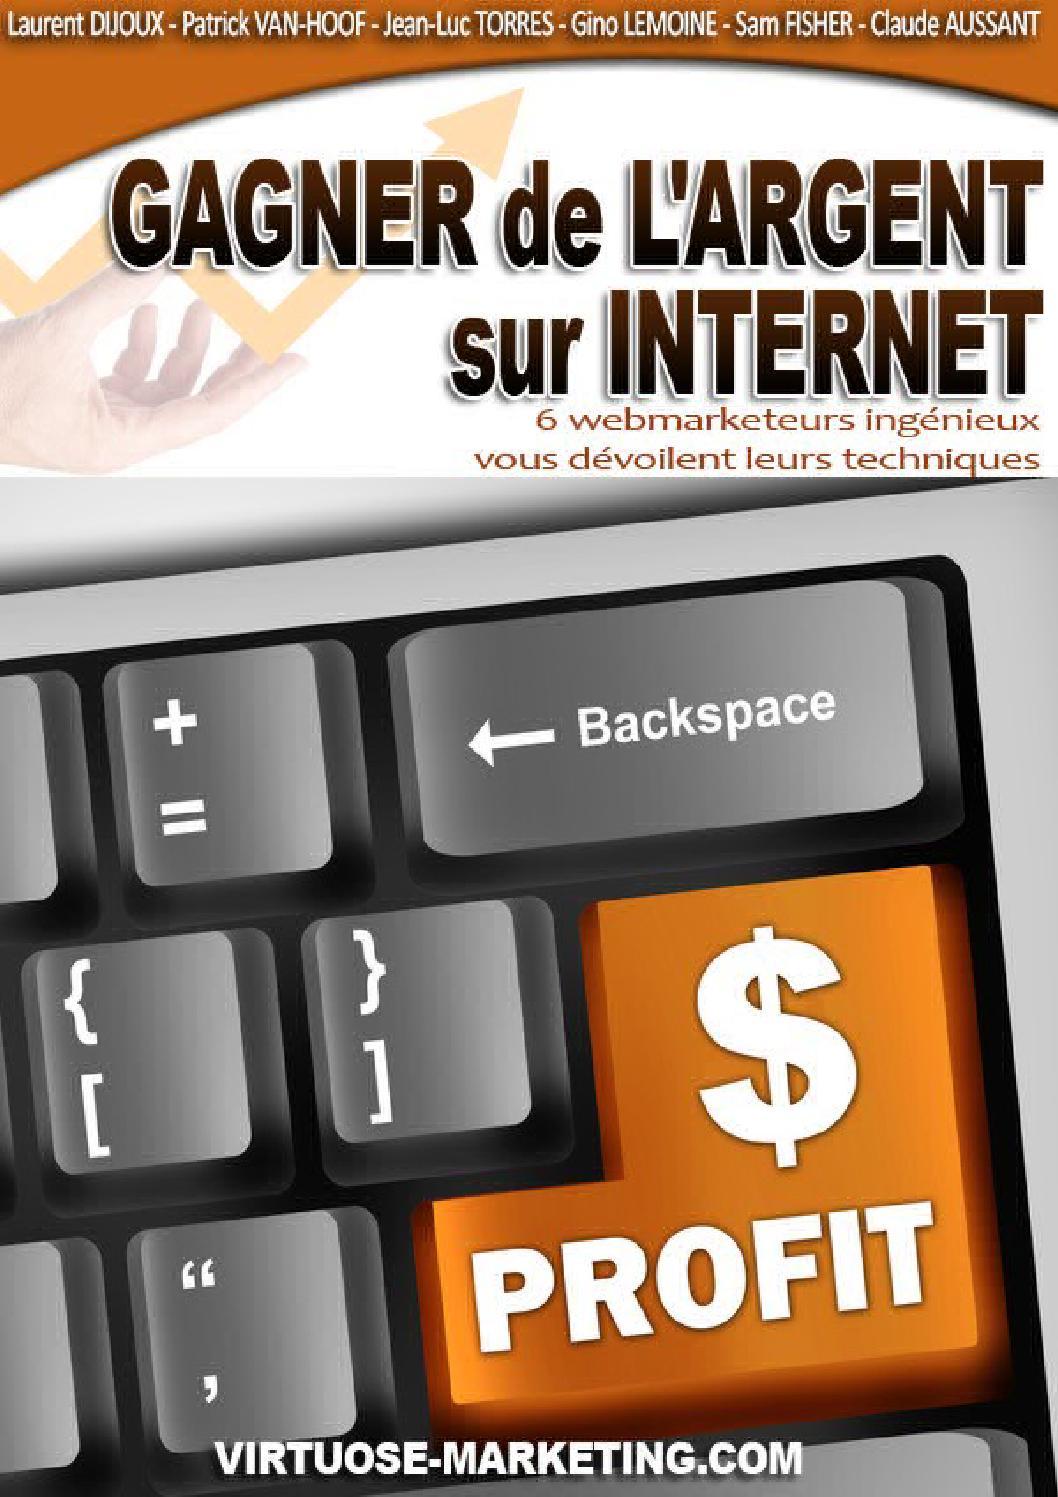 Gagner de l'argent sur Internet by Patrick PREMARTIN - Issuu